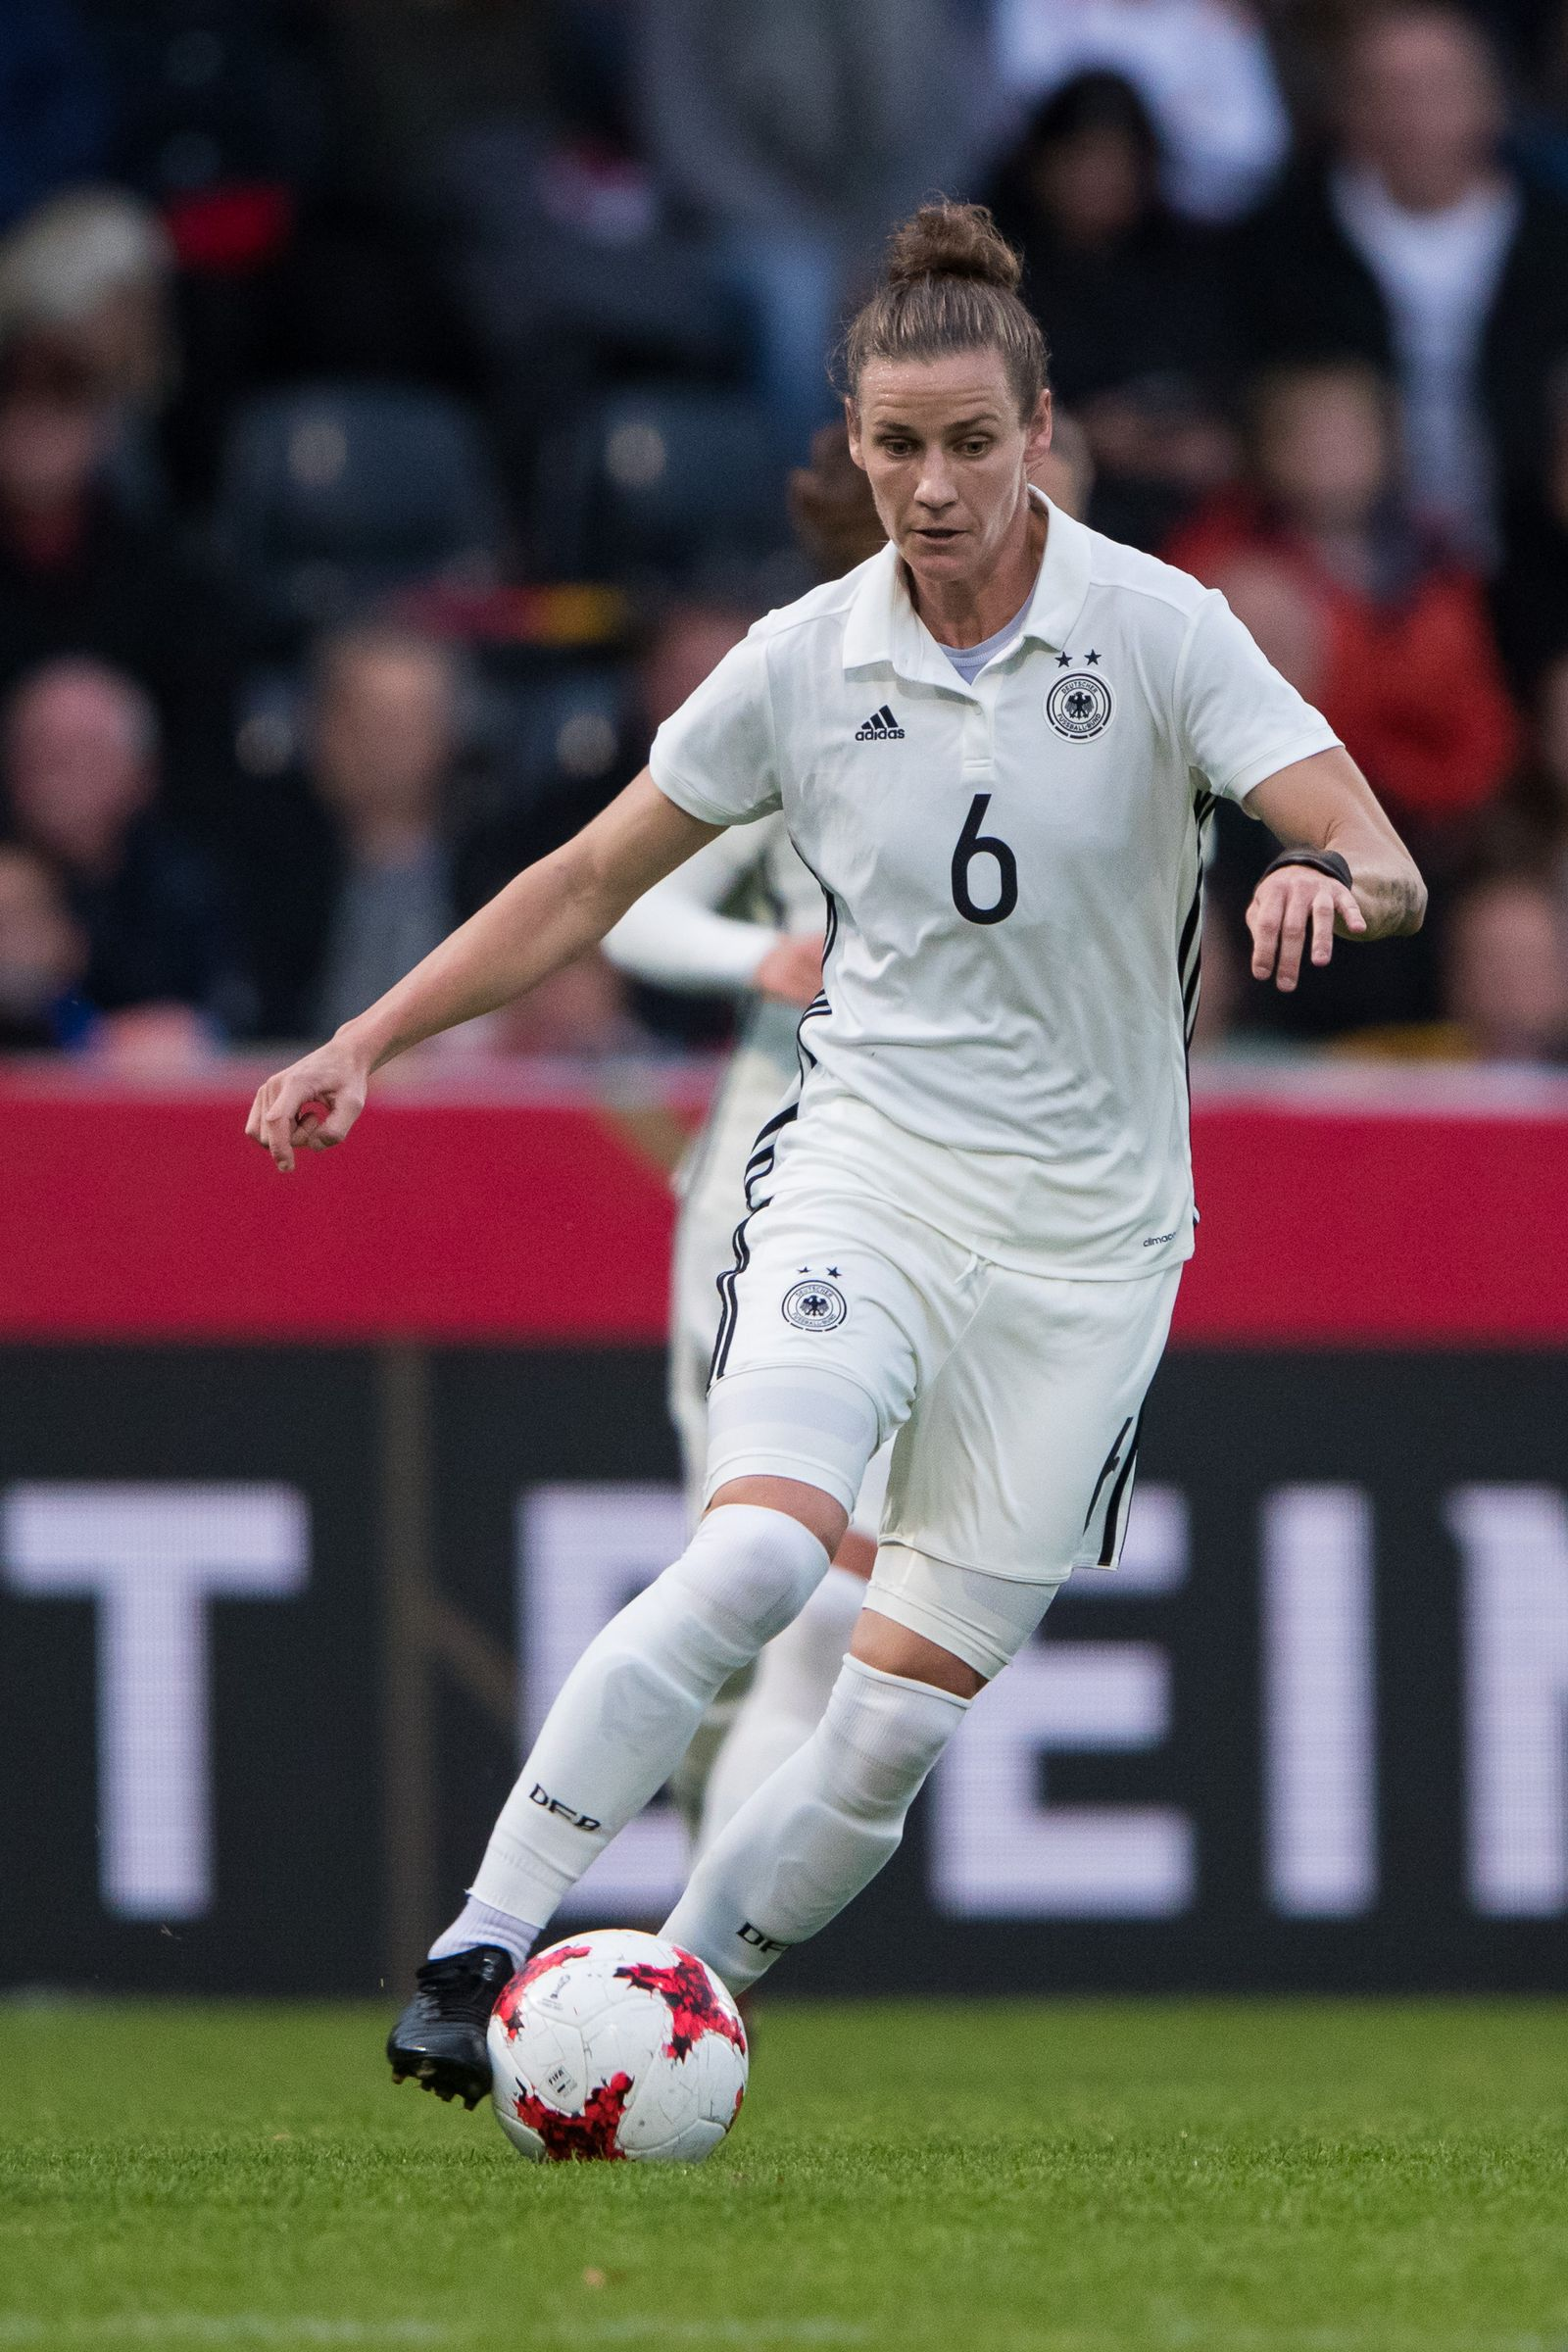 Simone Laudehr/ Nationalmannschaft 2017